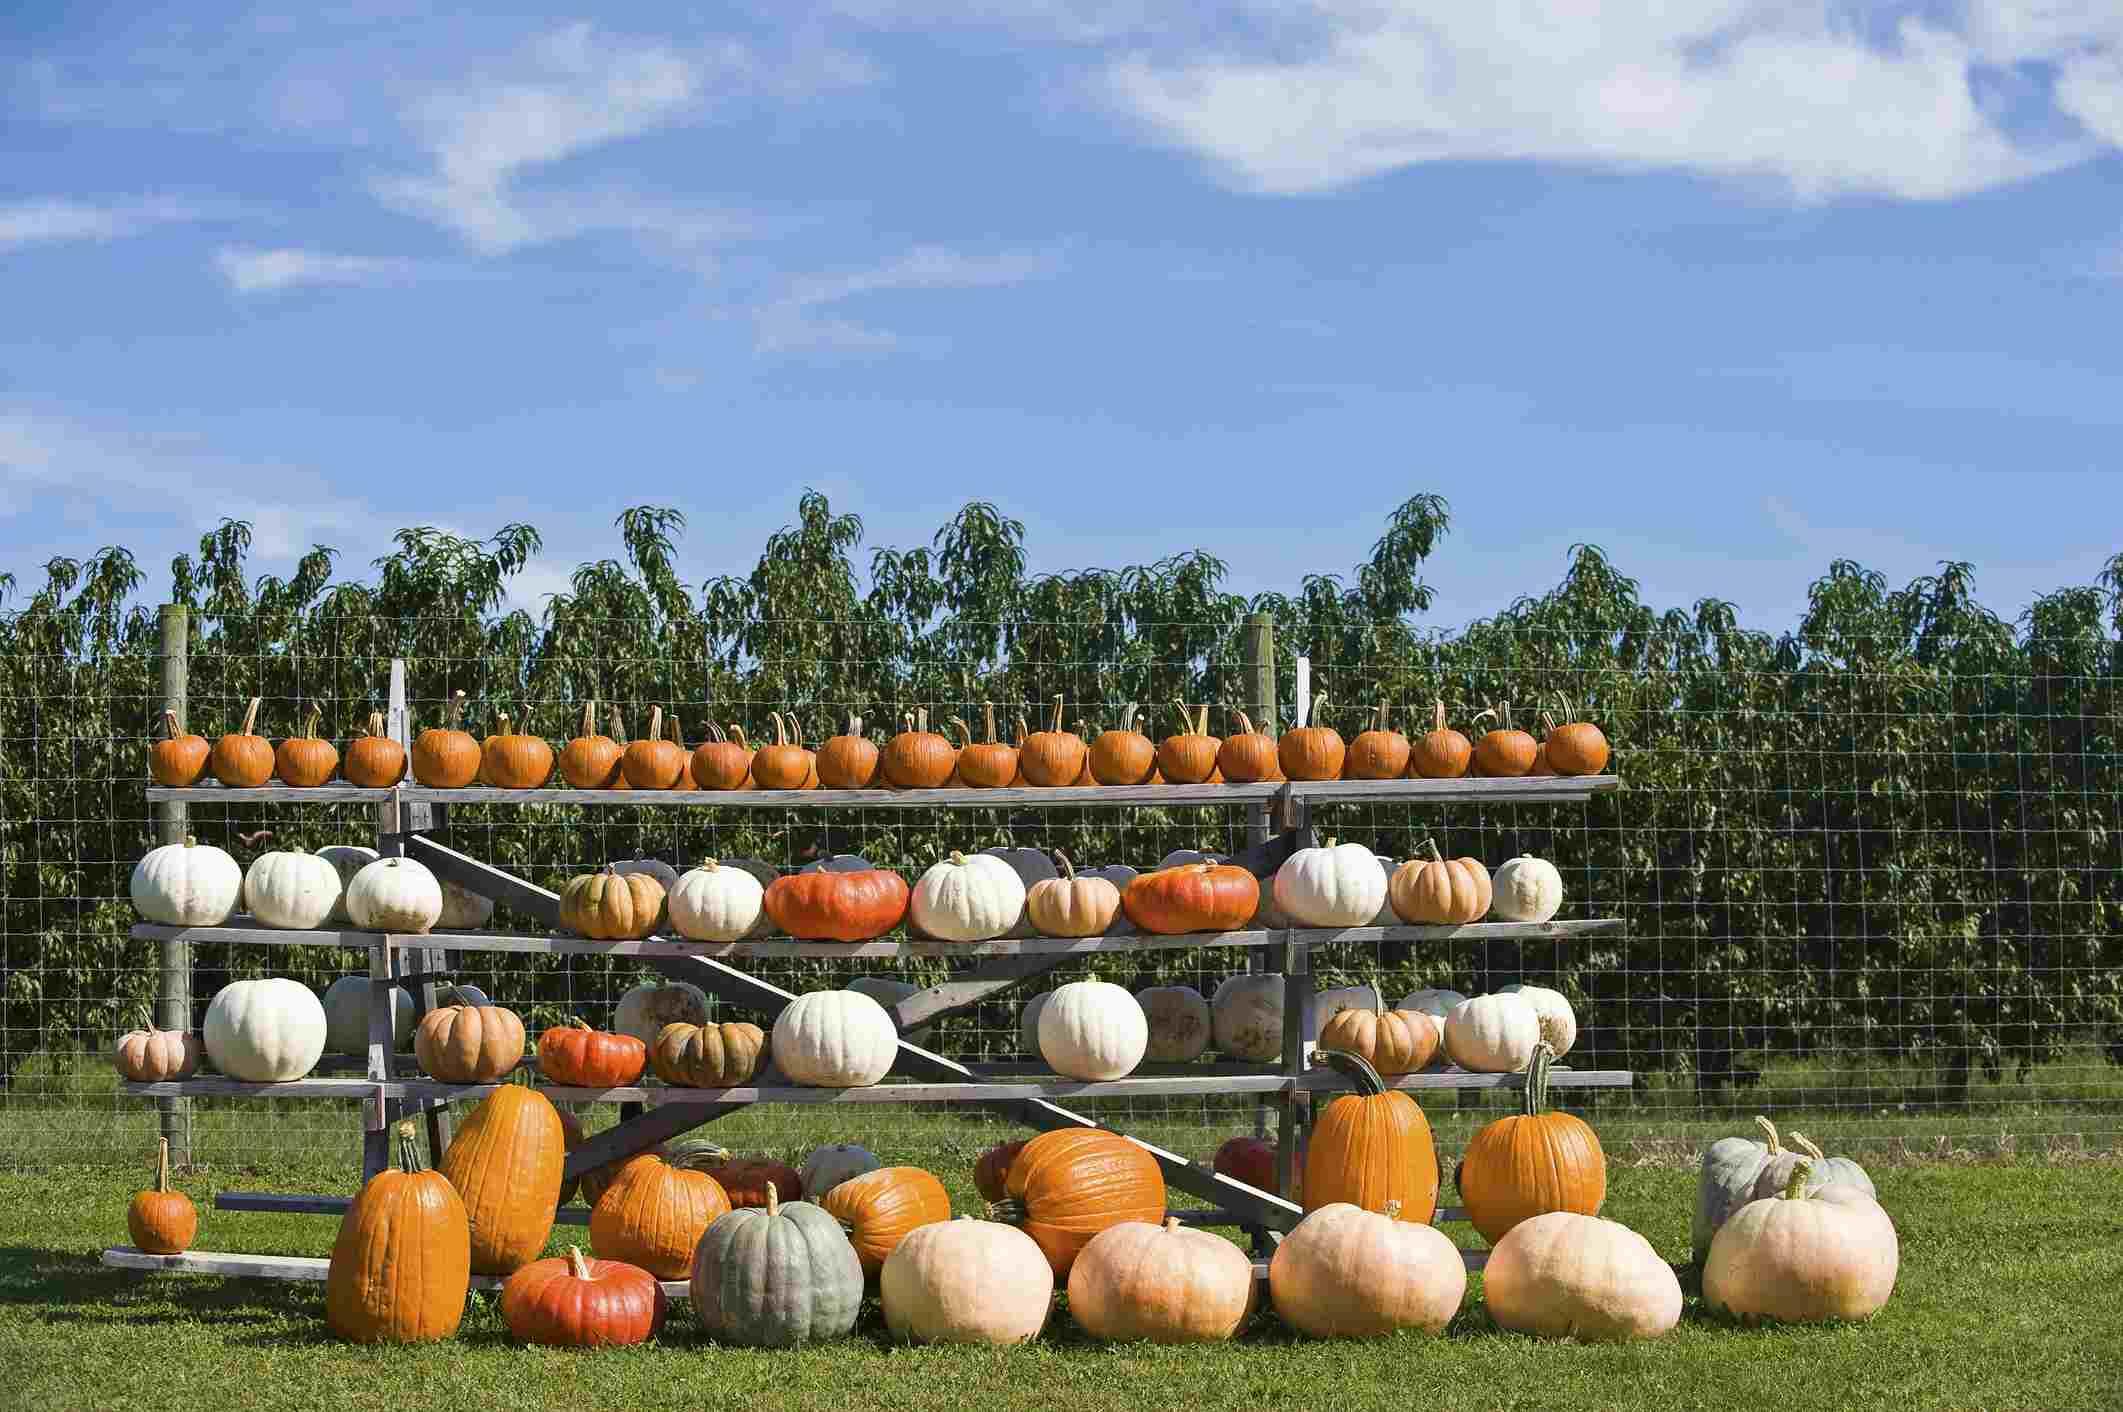 USA, New York State, East Hamptons, Assortment of Pumpkins